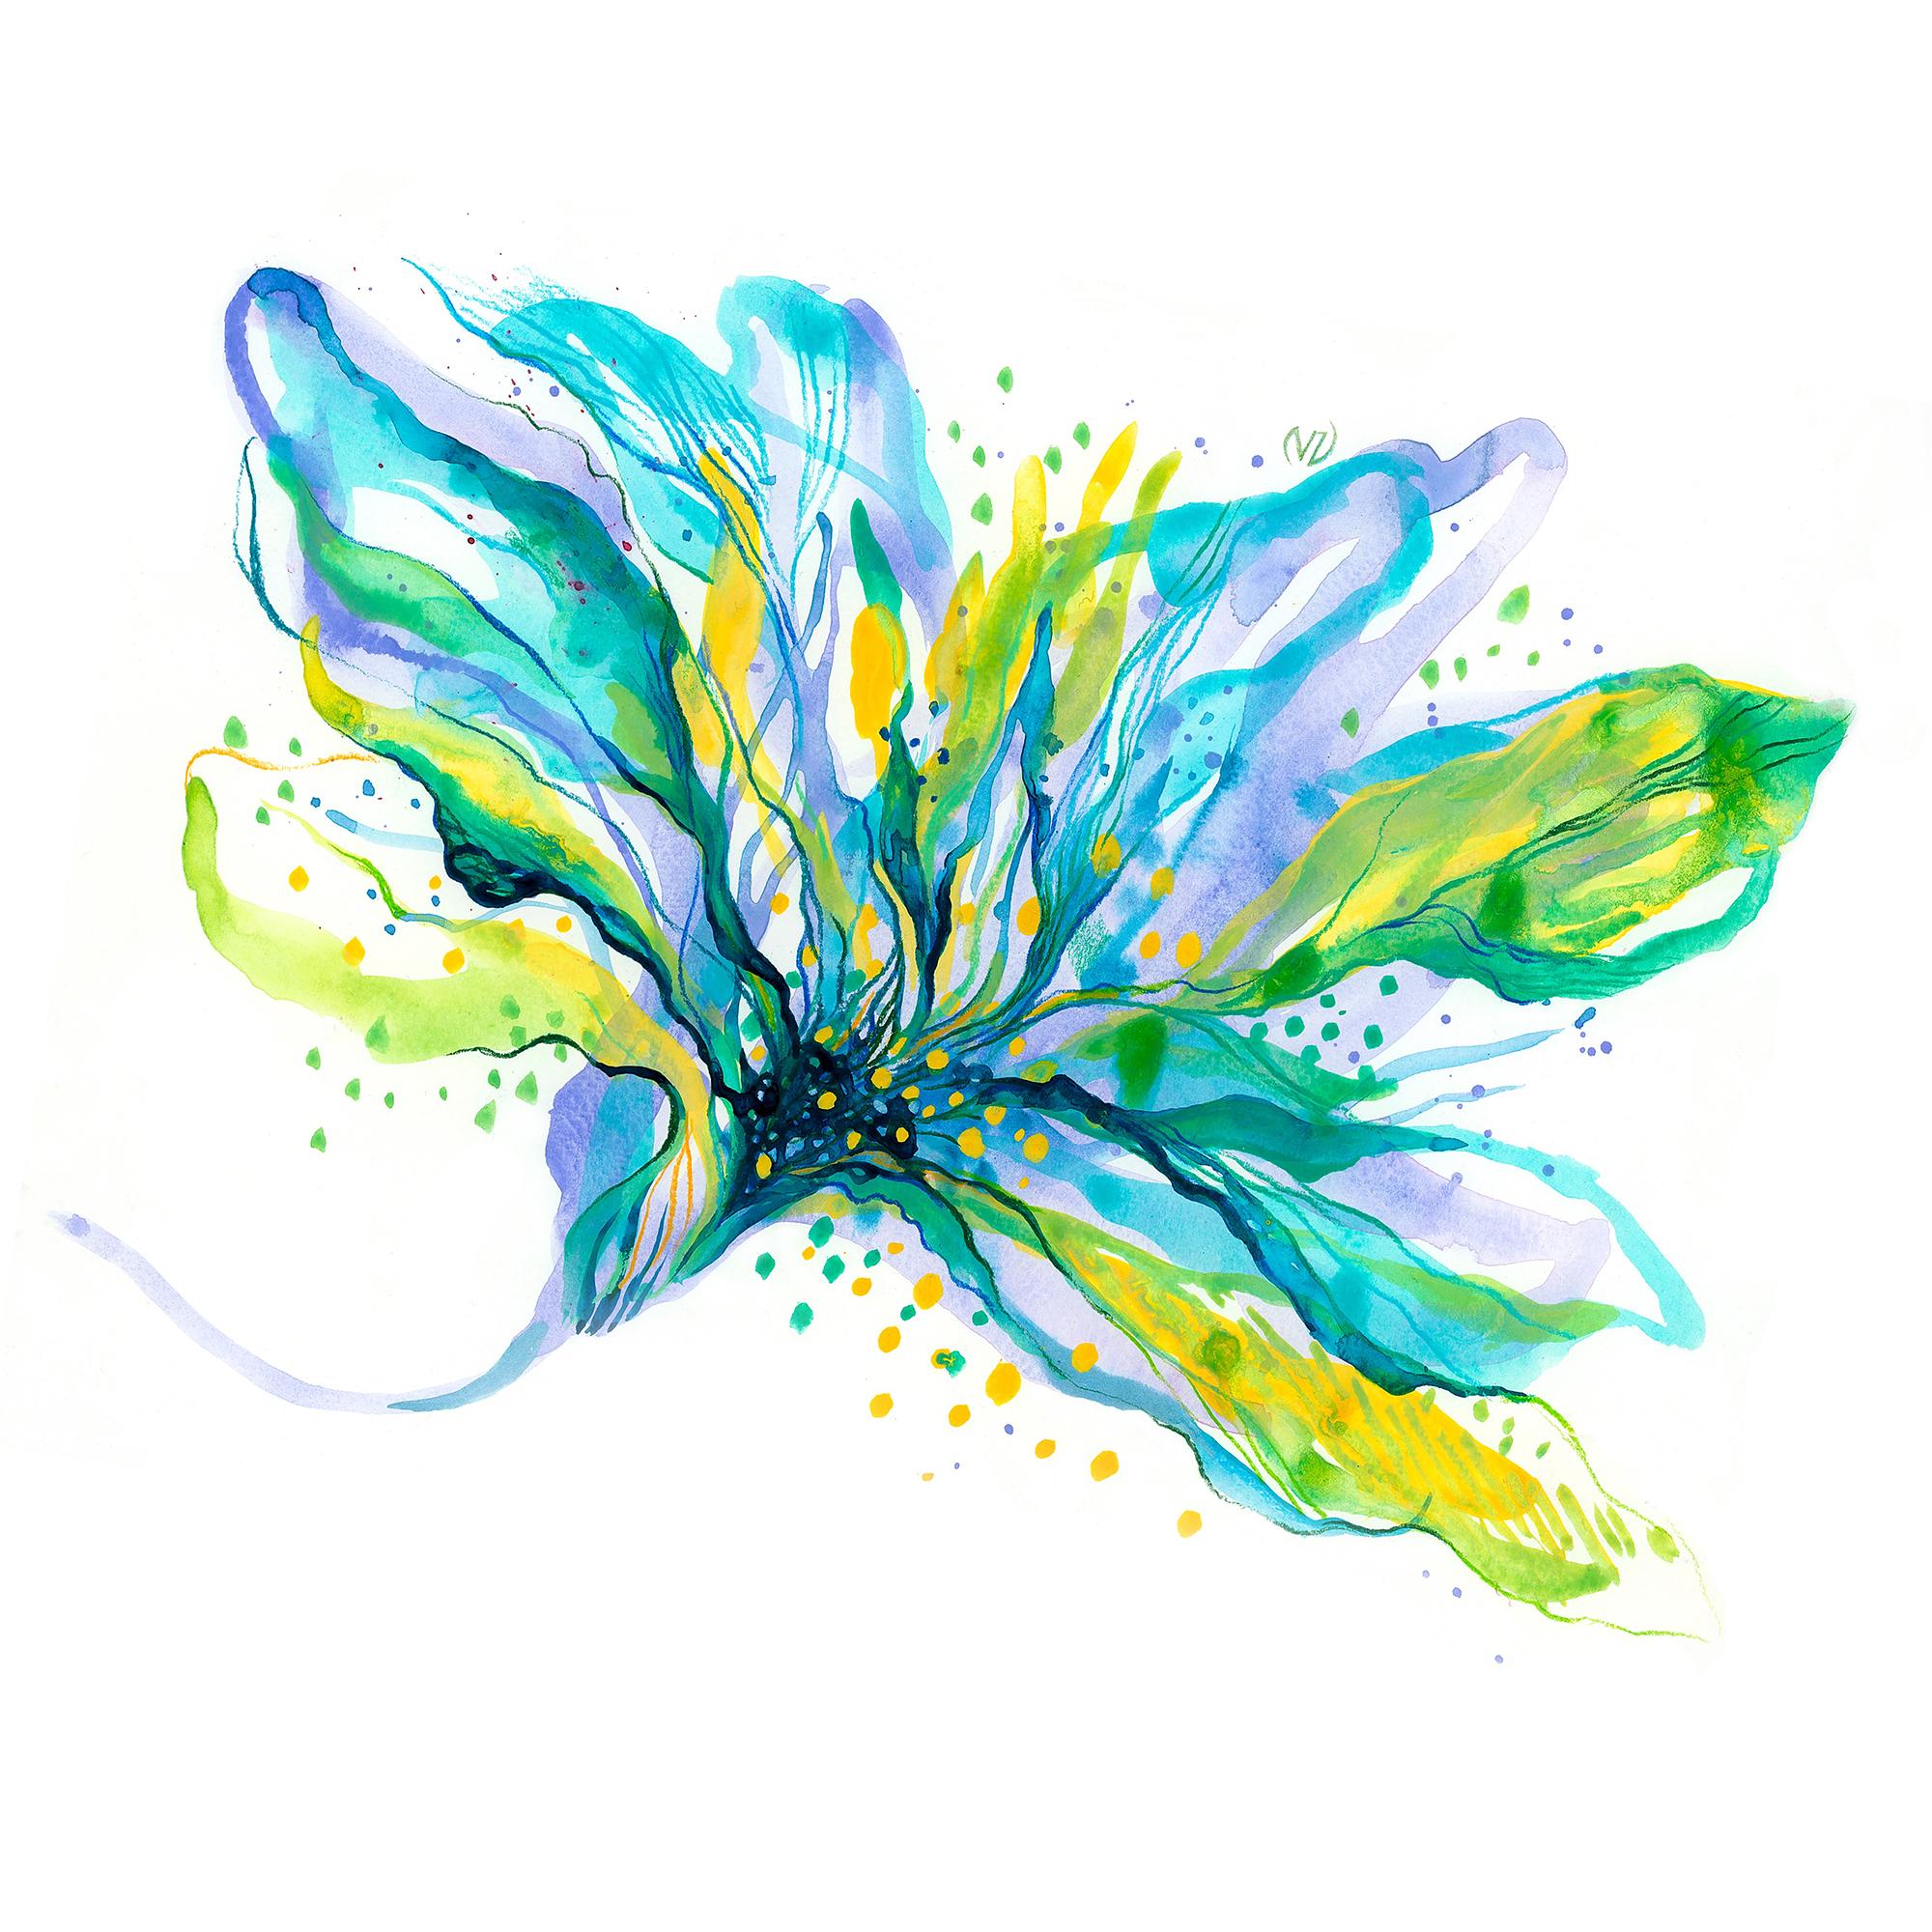 40x40-BlueFlower-ViorikaZagorowska-ArtForSale